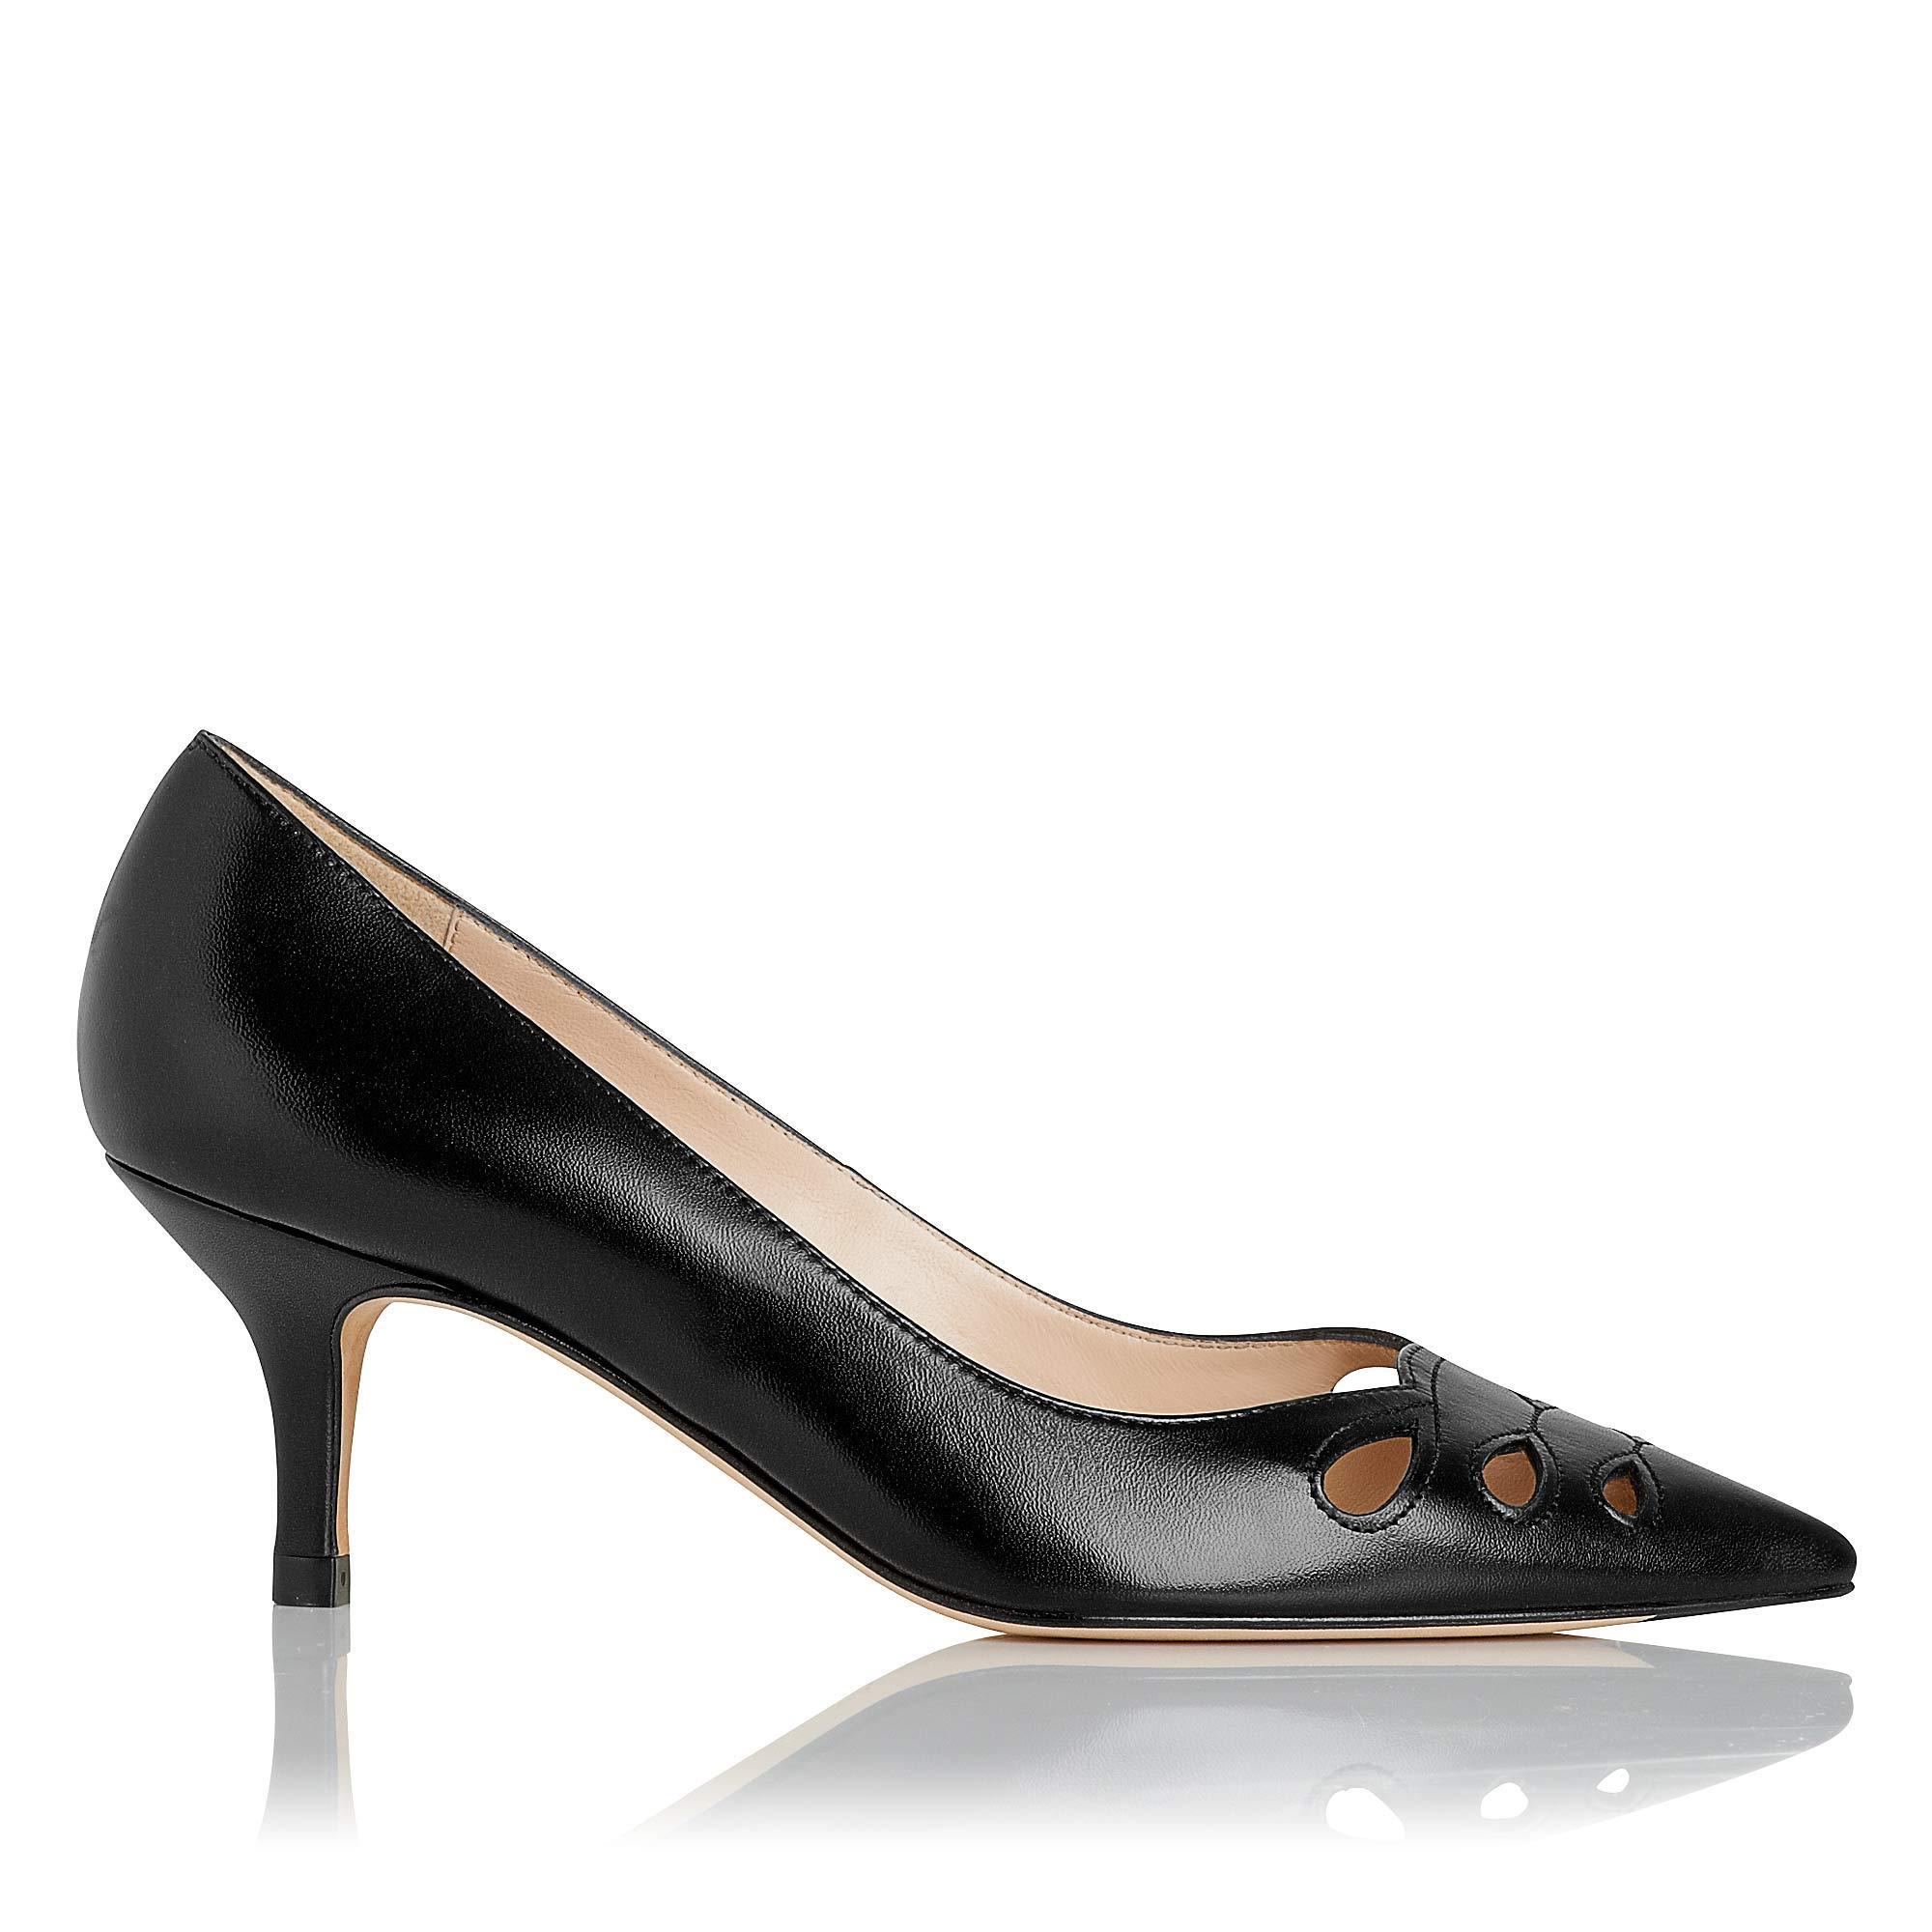 c5b67820431 Marlie Leather Cut Out Detail Point Toe Kitten Heel